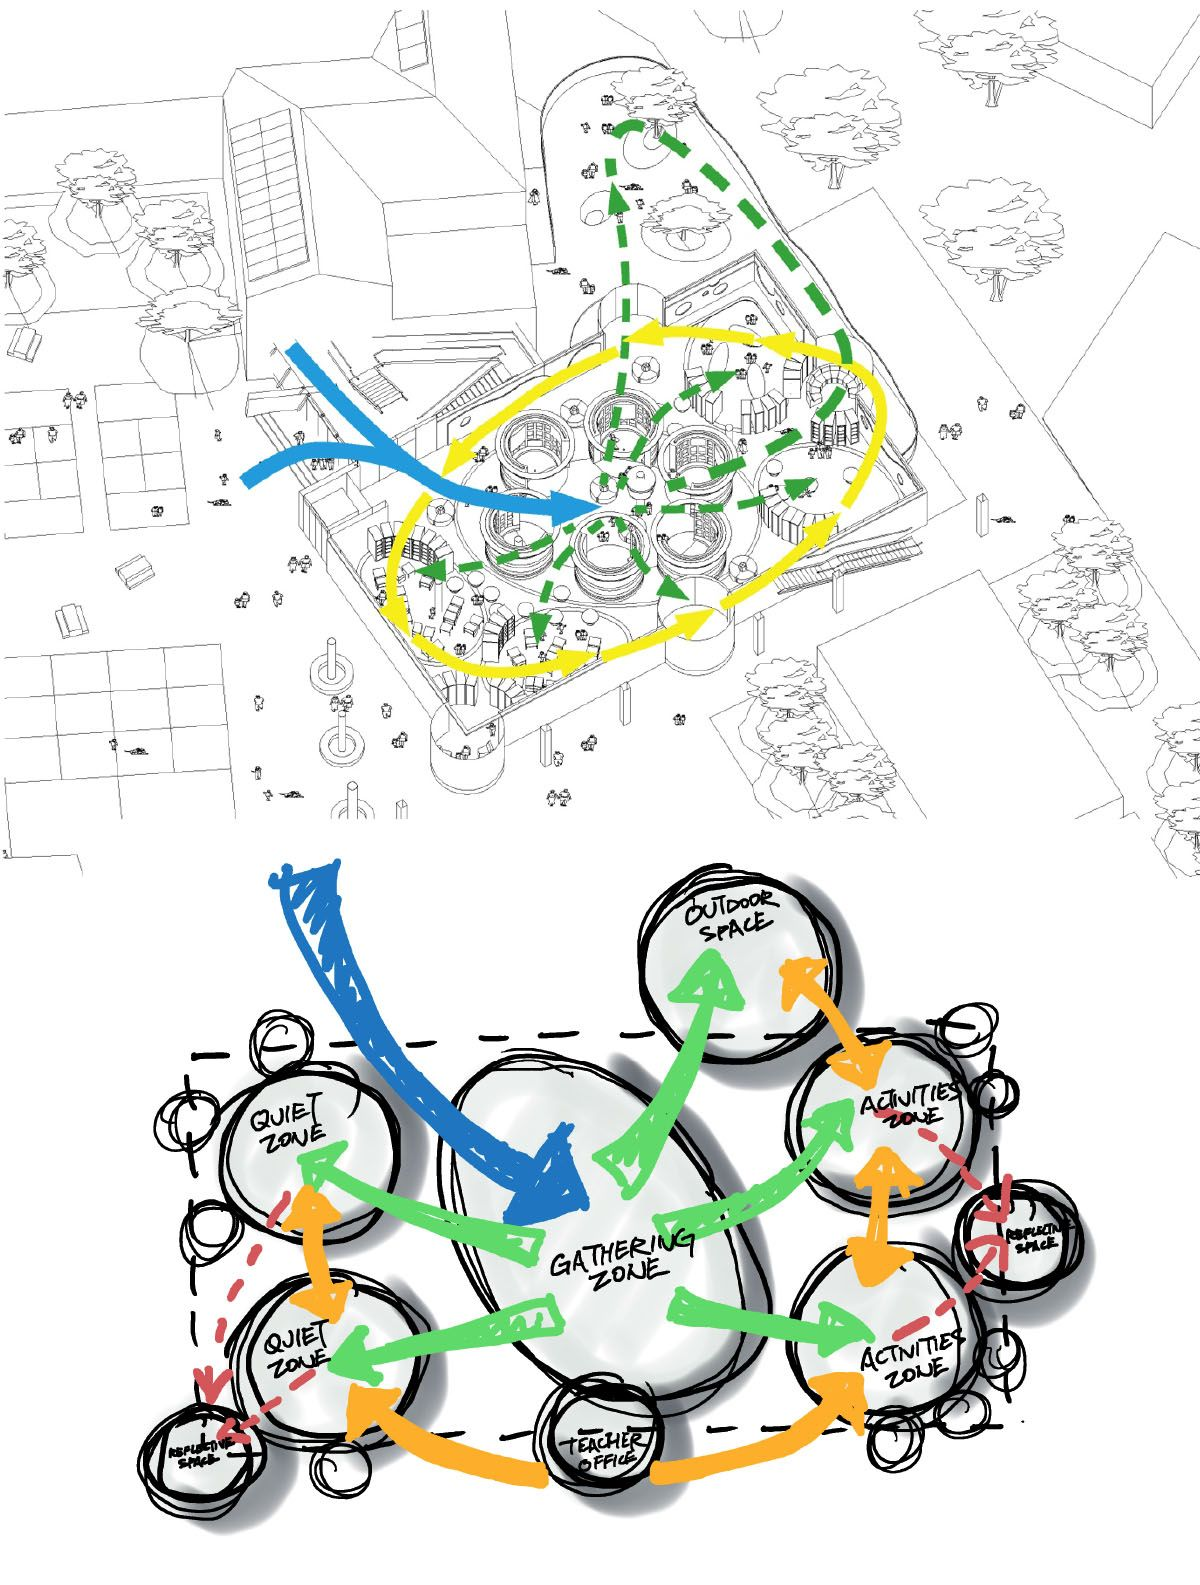 small resolution of flemington primary school interior design circulation and movement diagrams